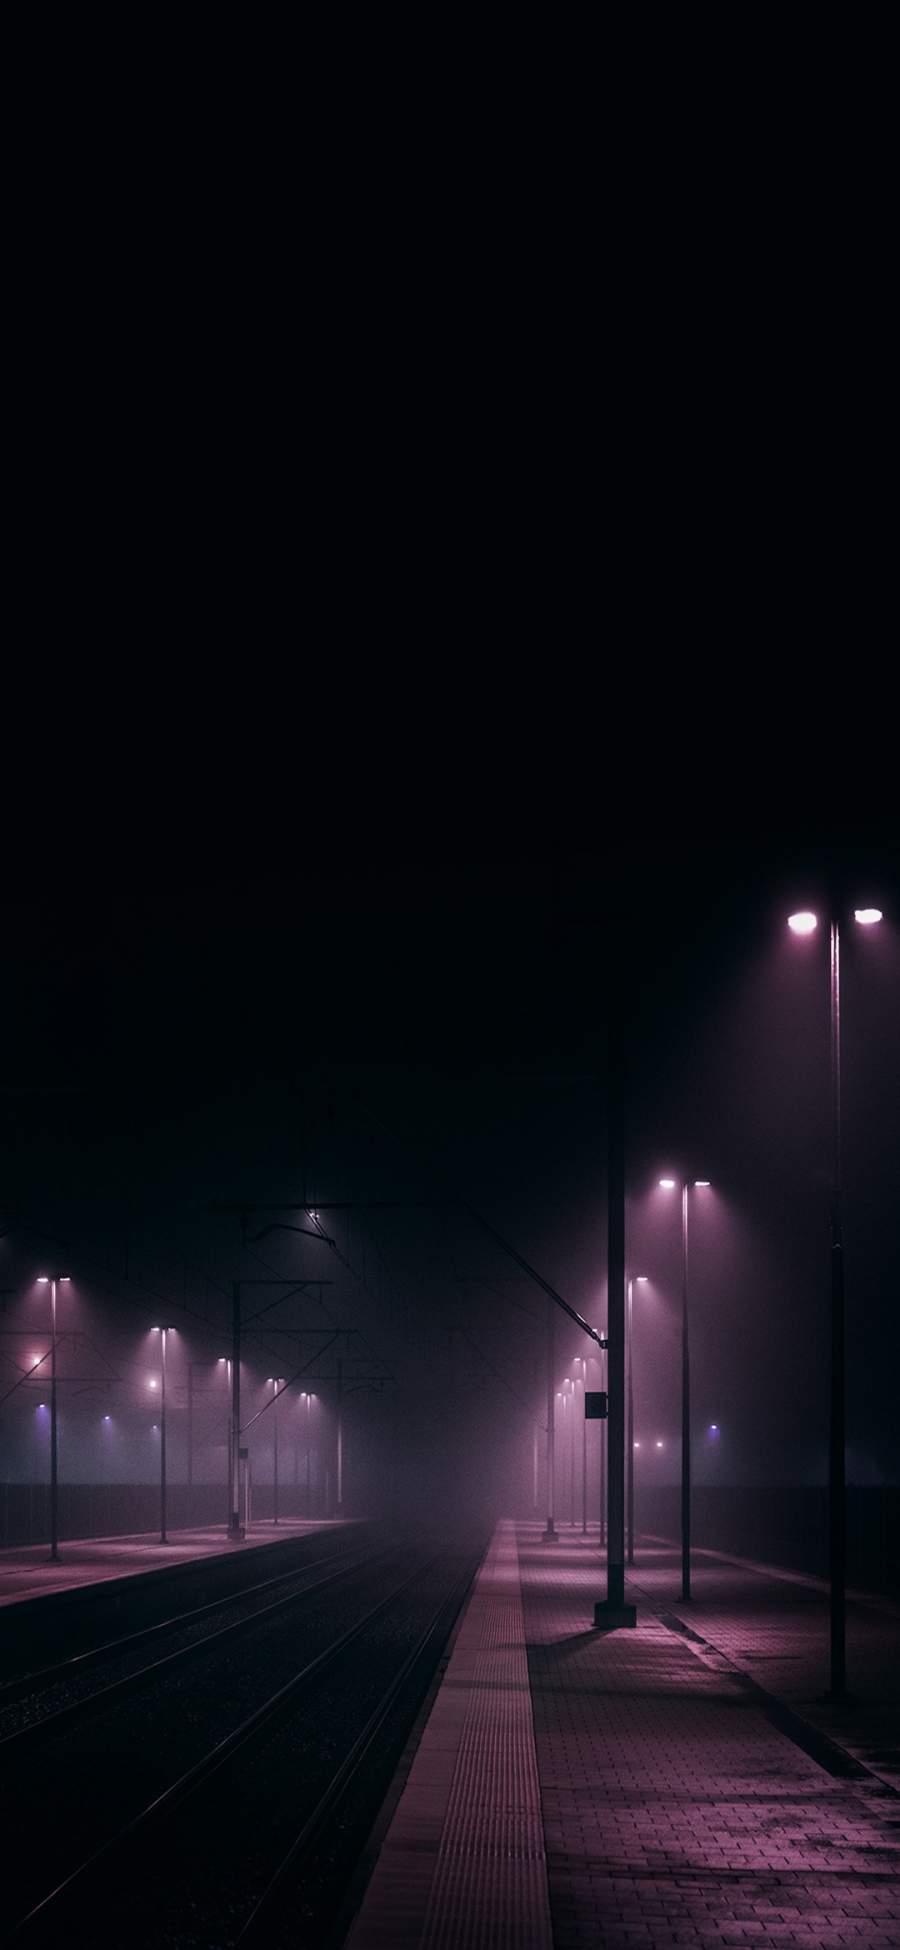 Night Lights iPhone Wallpaper